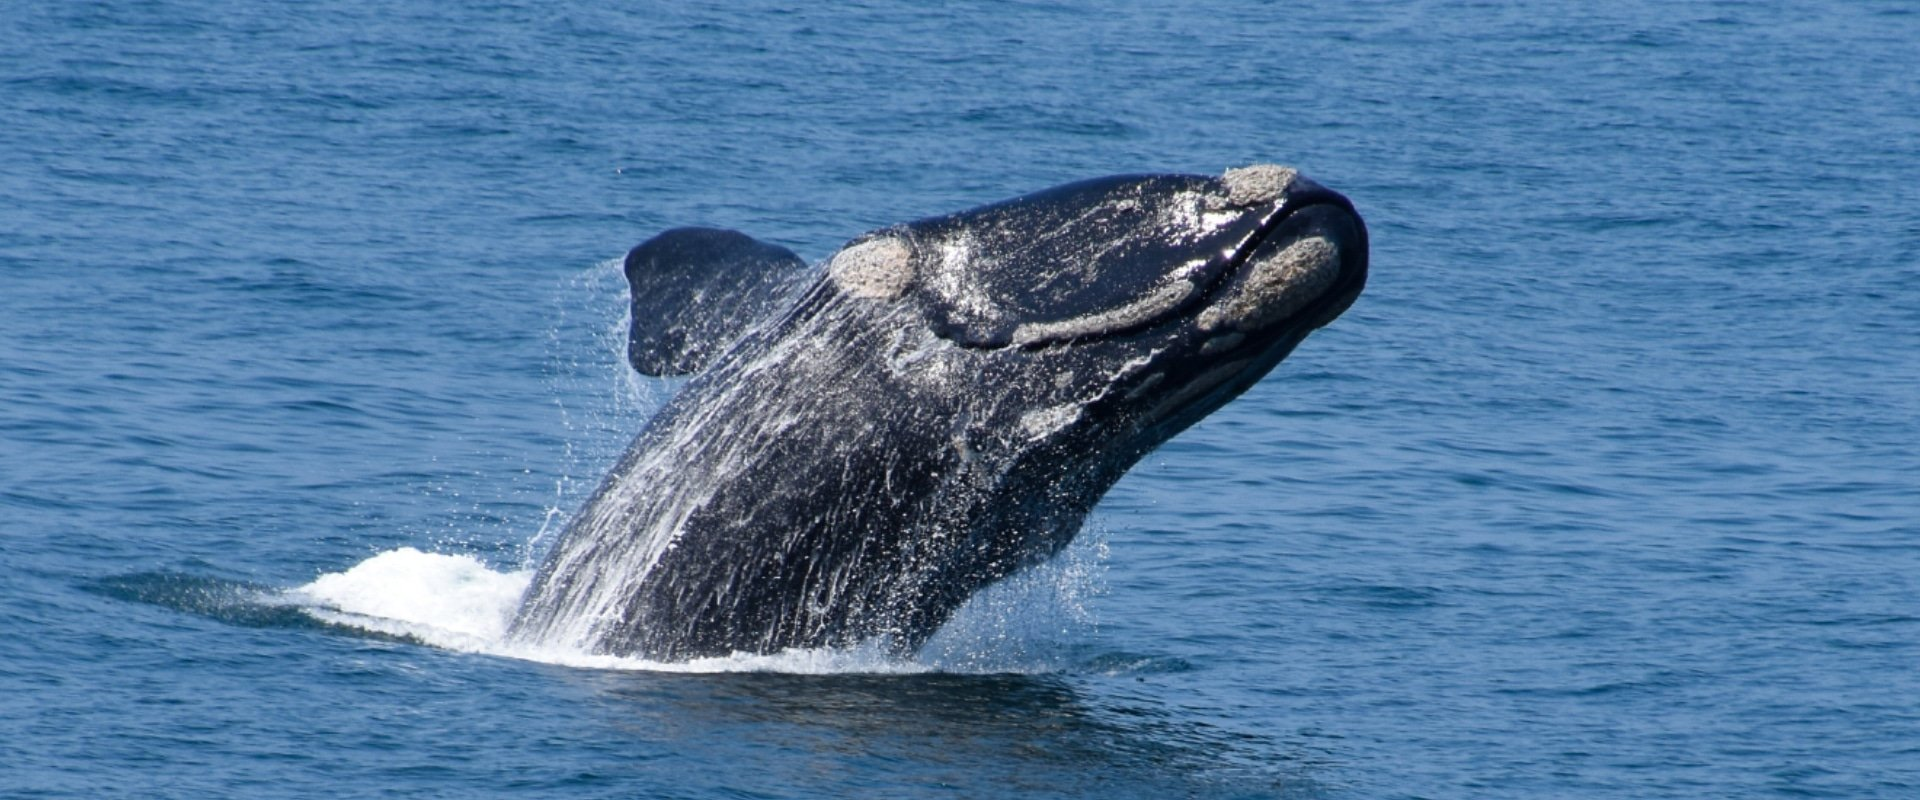 Witness majestic whales